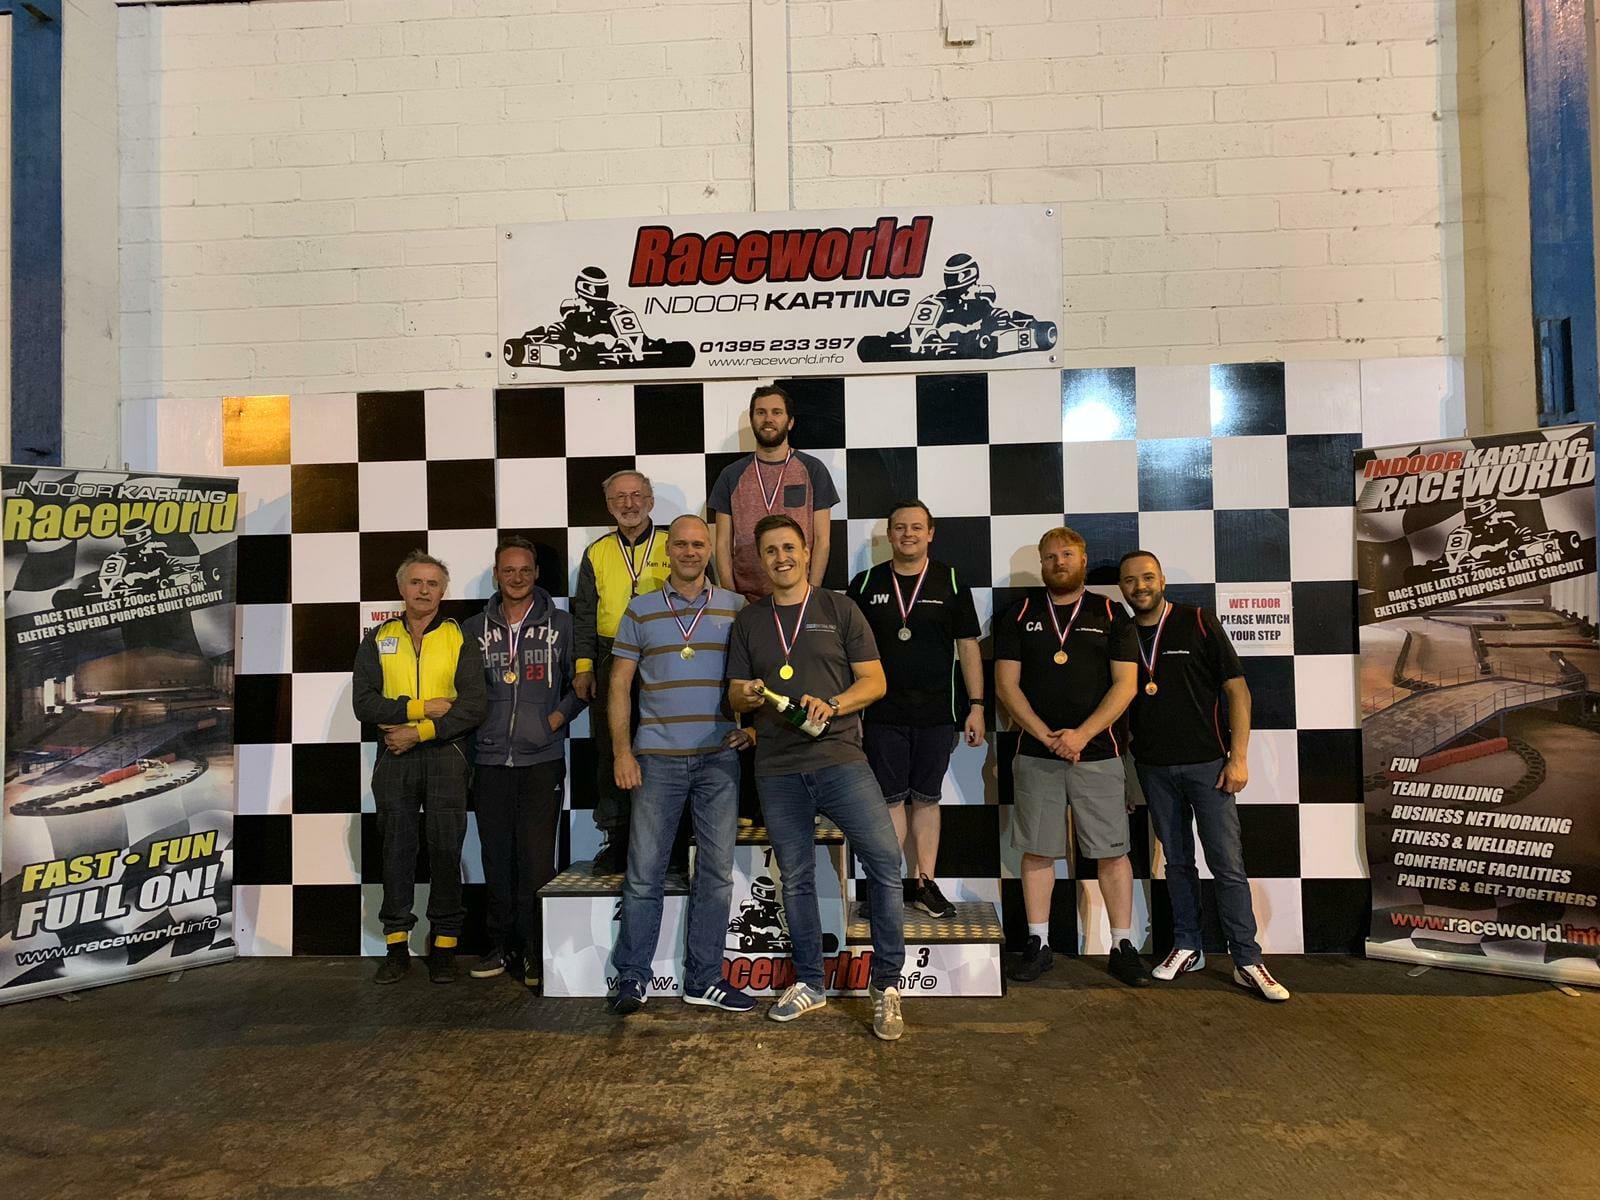 kart-race-win-for-charity-1